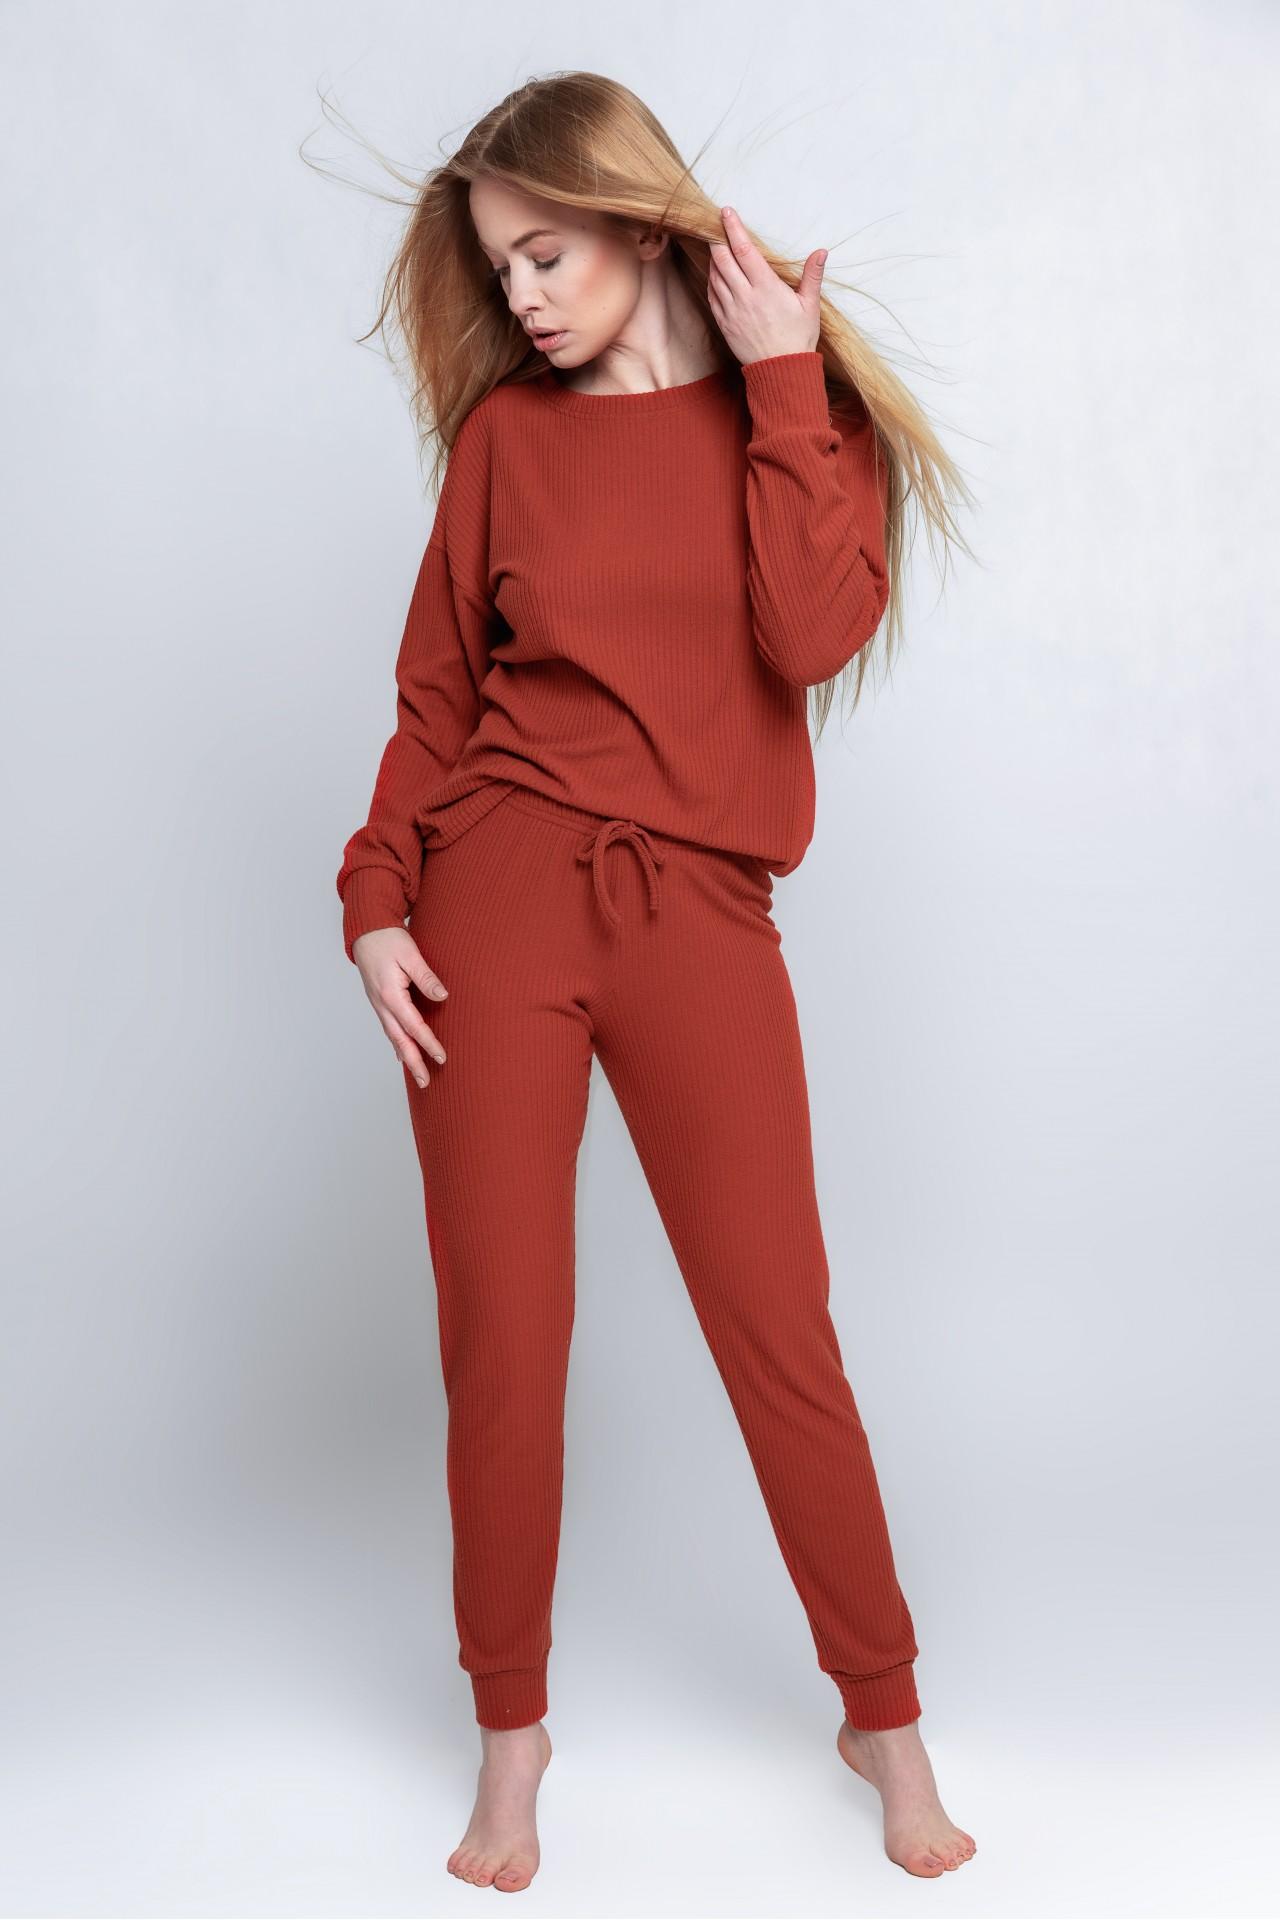 Пижама Pizama Orange Woman